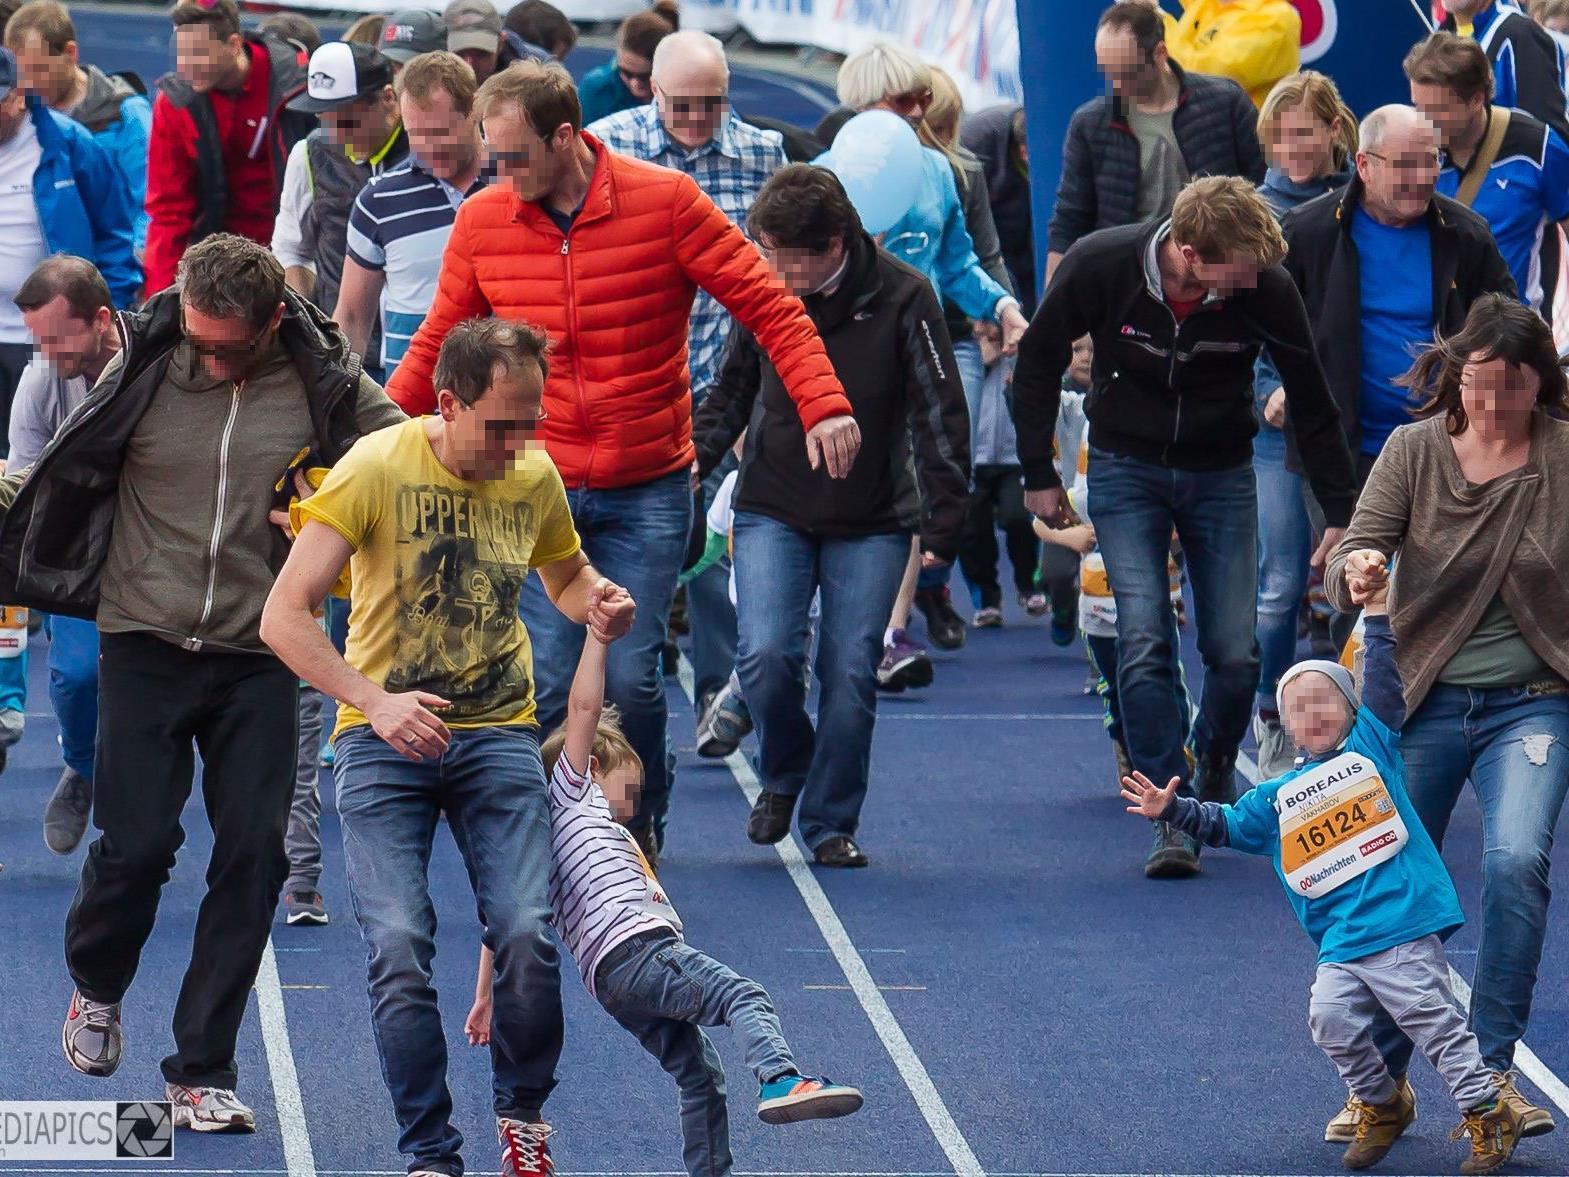 Falscher Ehrgeiz: Eltern zerren Kinder ins Ziel